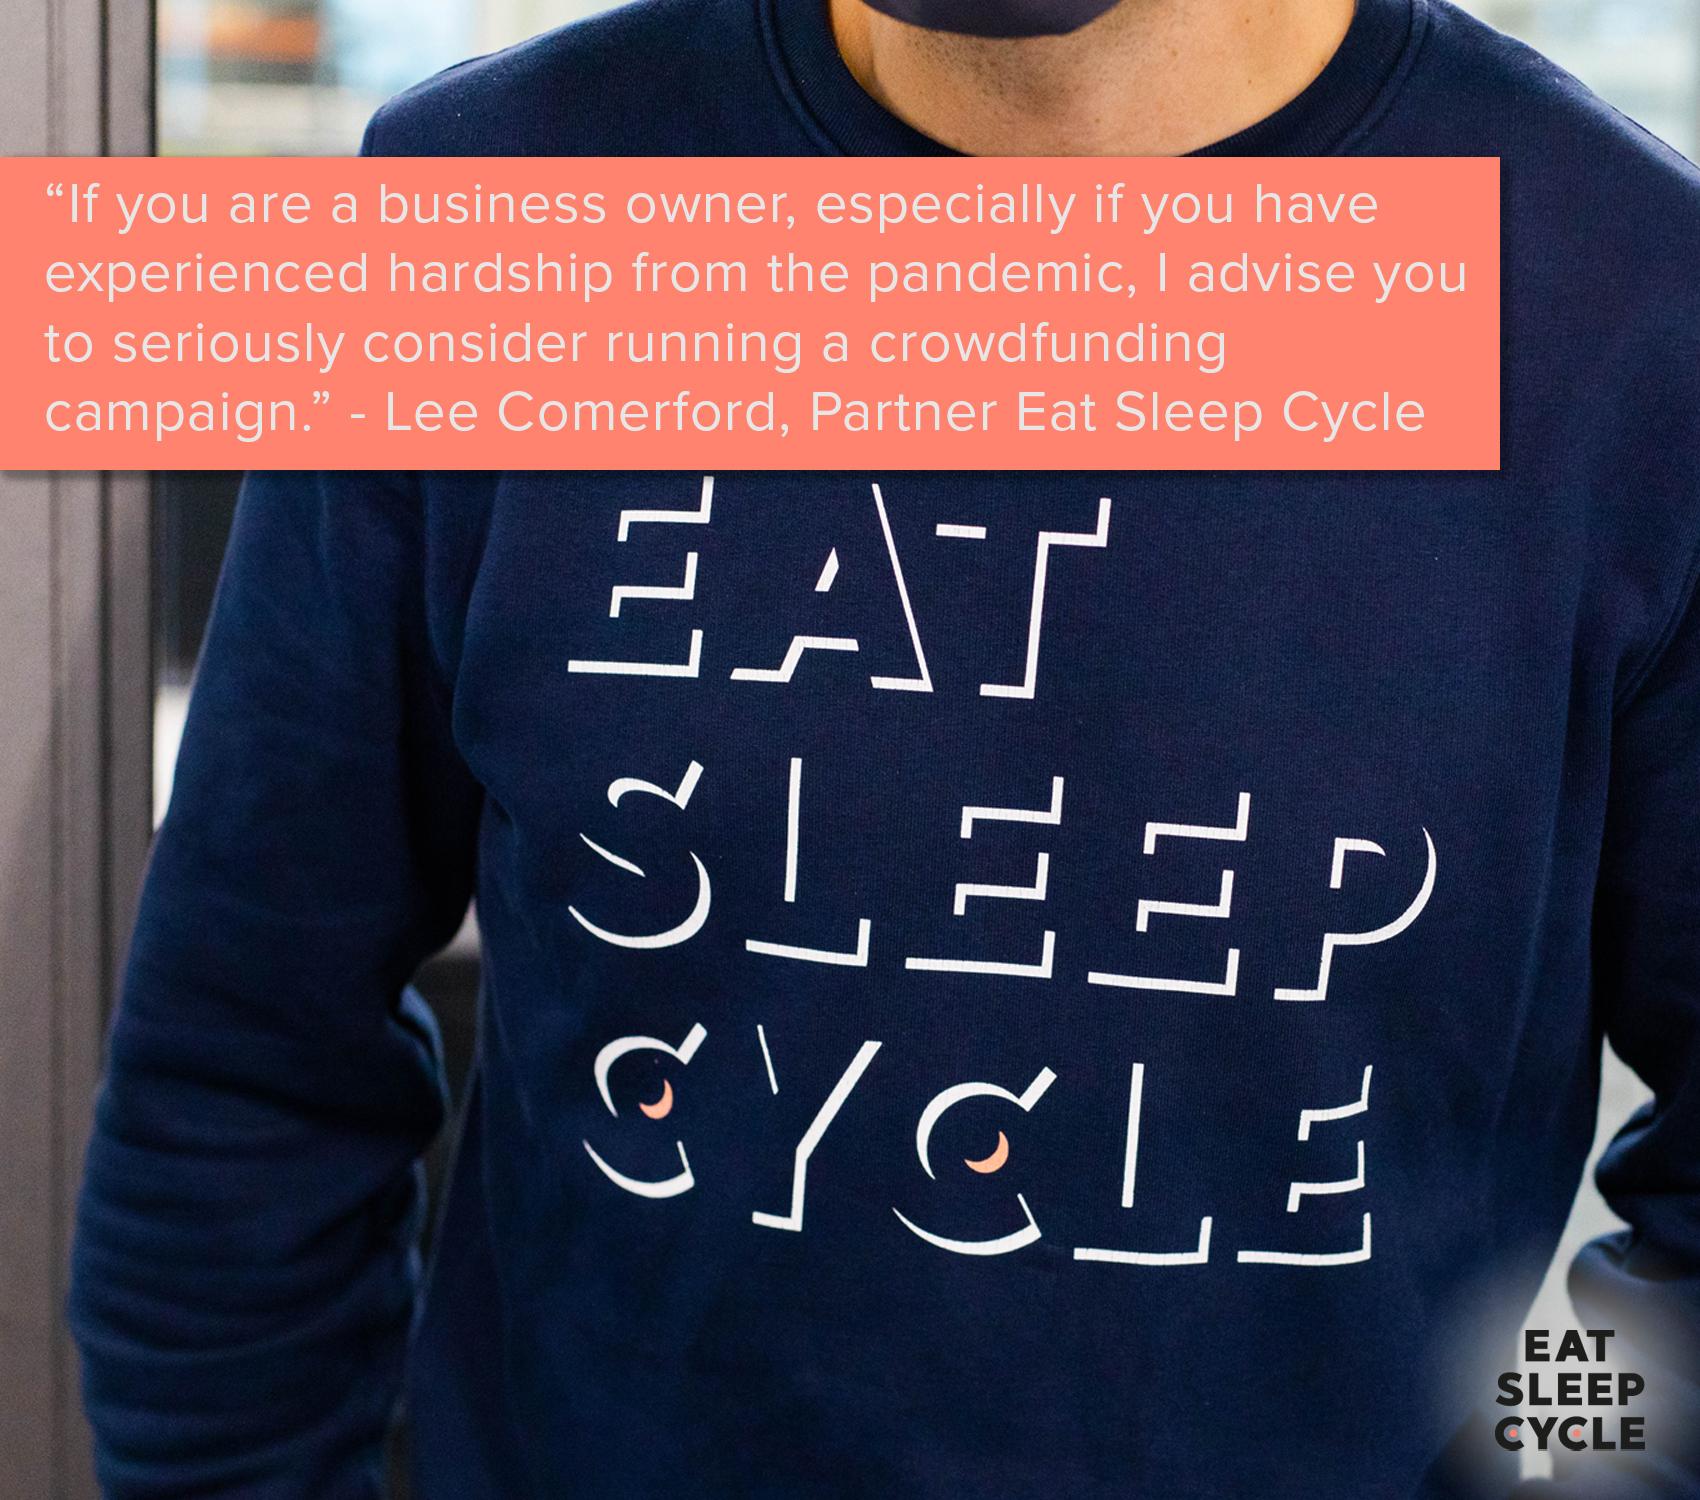 Eat-Sleep-Cycle-Hub-Cafe-Crowdfunding-Interview-Lee